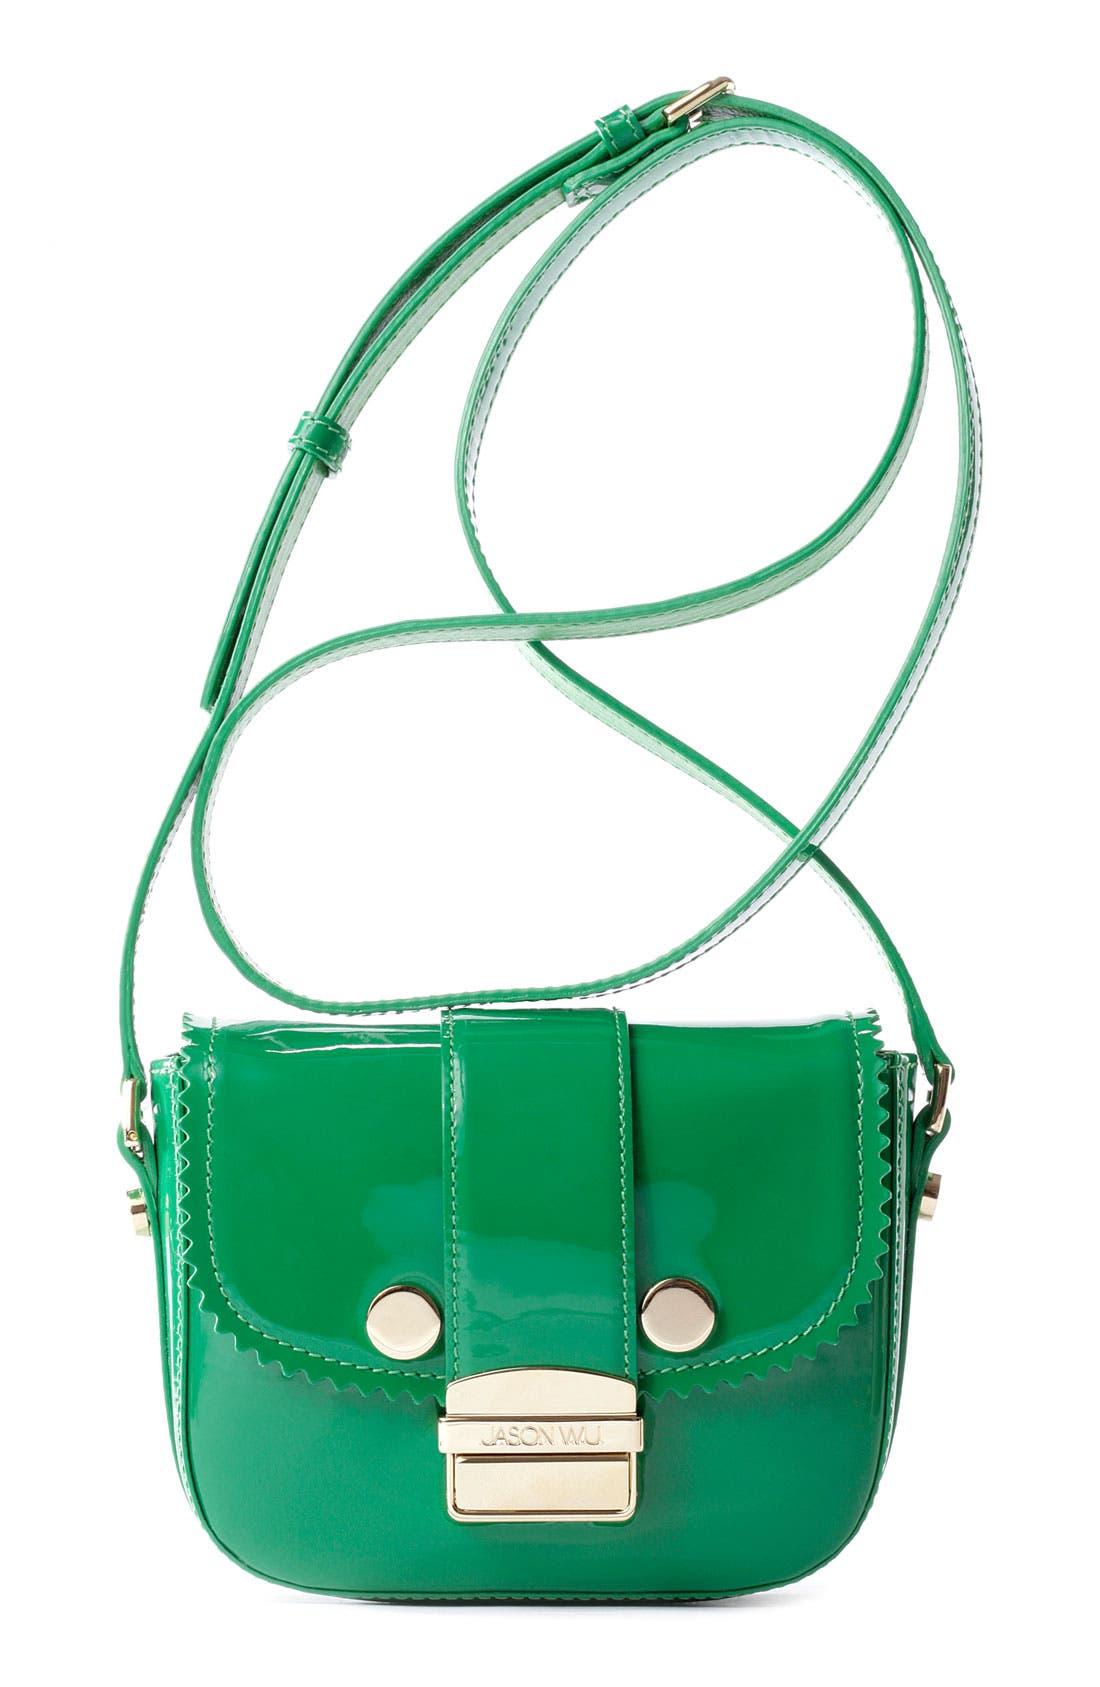 Main Image - Jason Wu 'Mini Miss Wu' Patent Leather Crossbody Bag